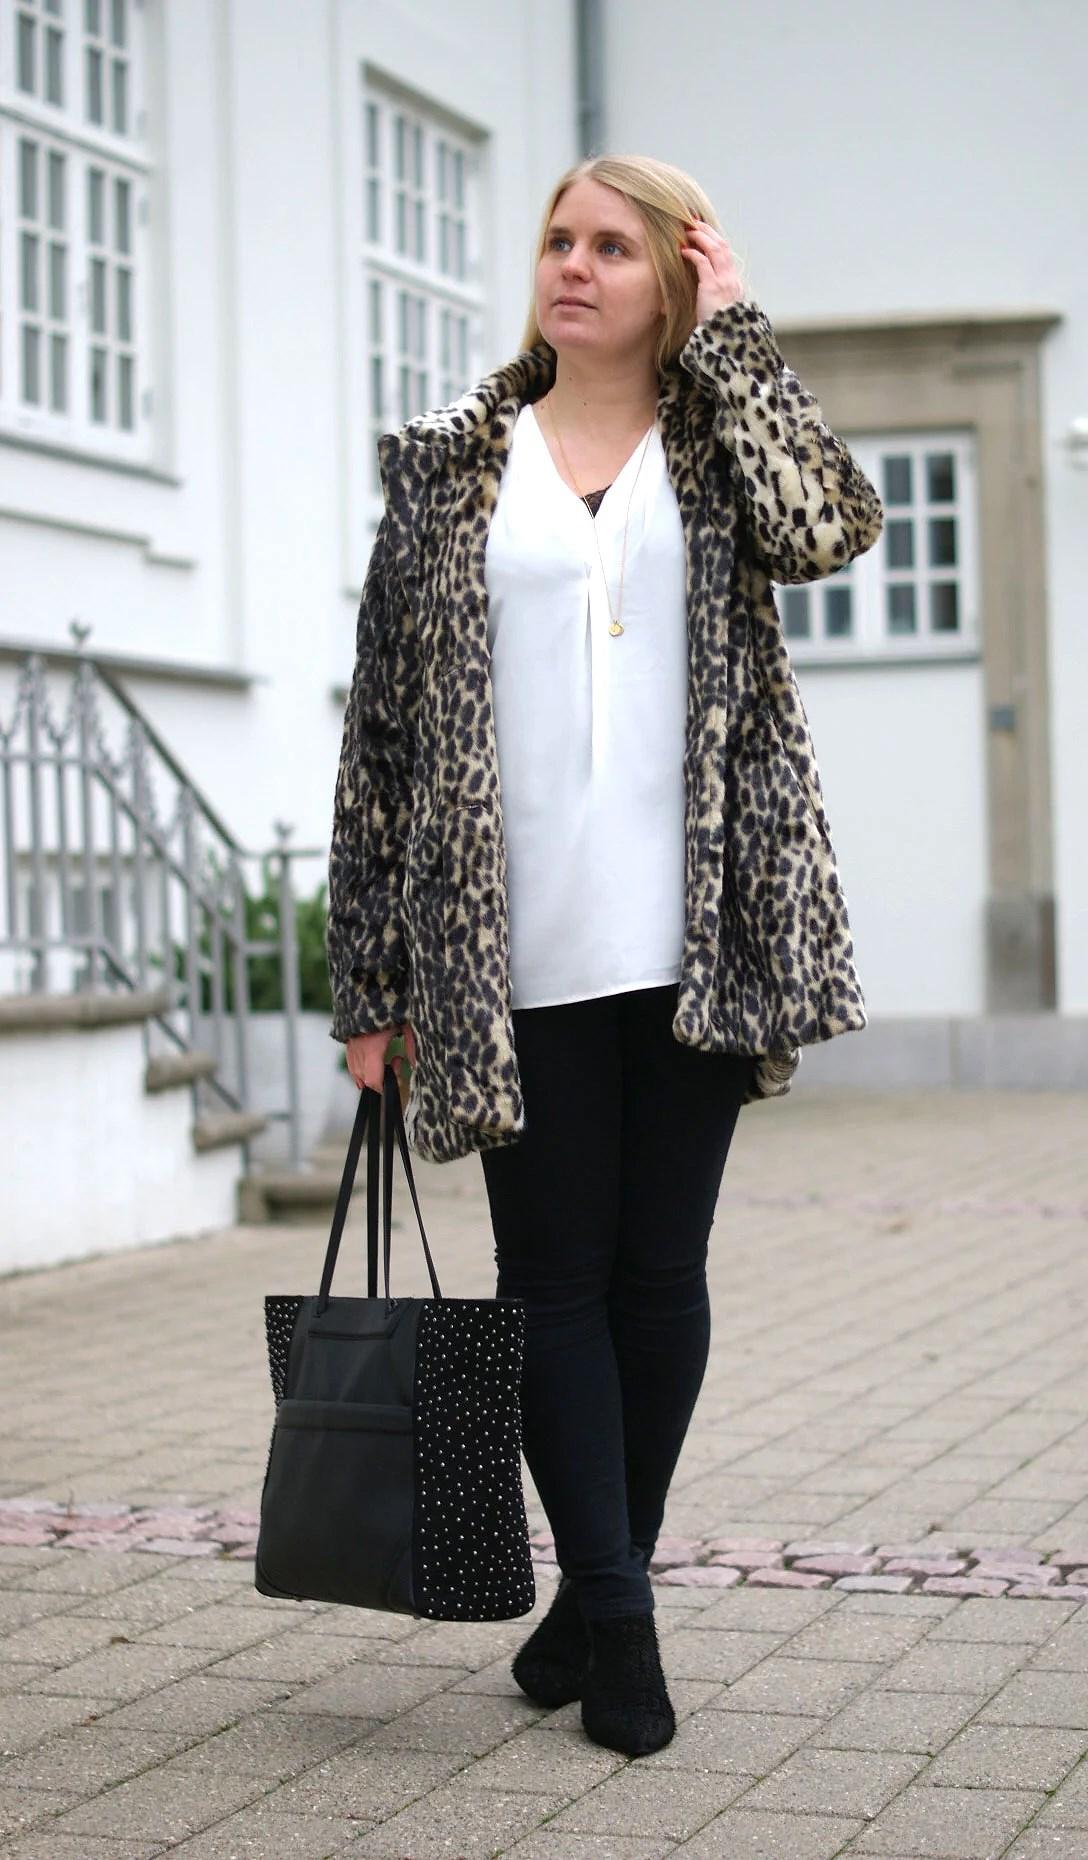 Dansk modeblogger, Julie Mænnchen, It's My Passions